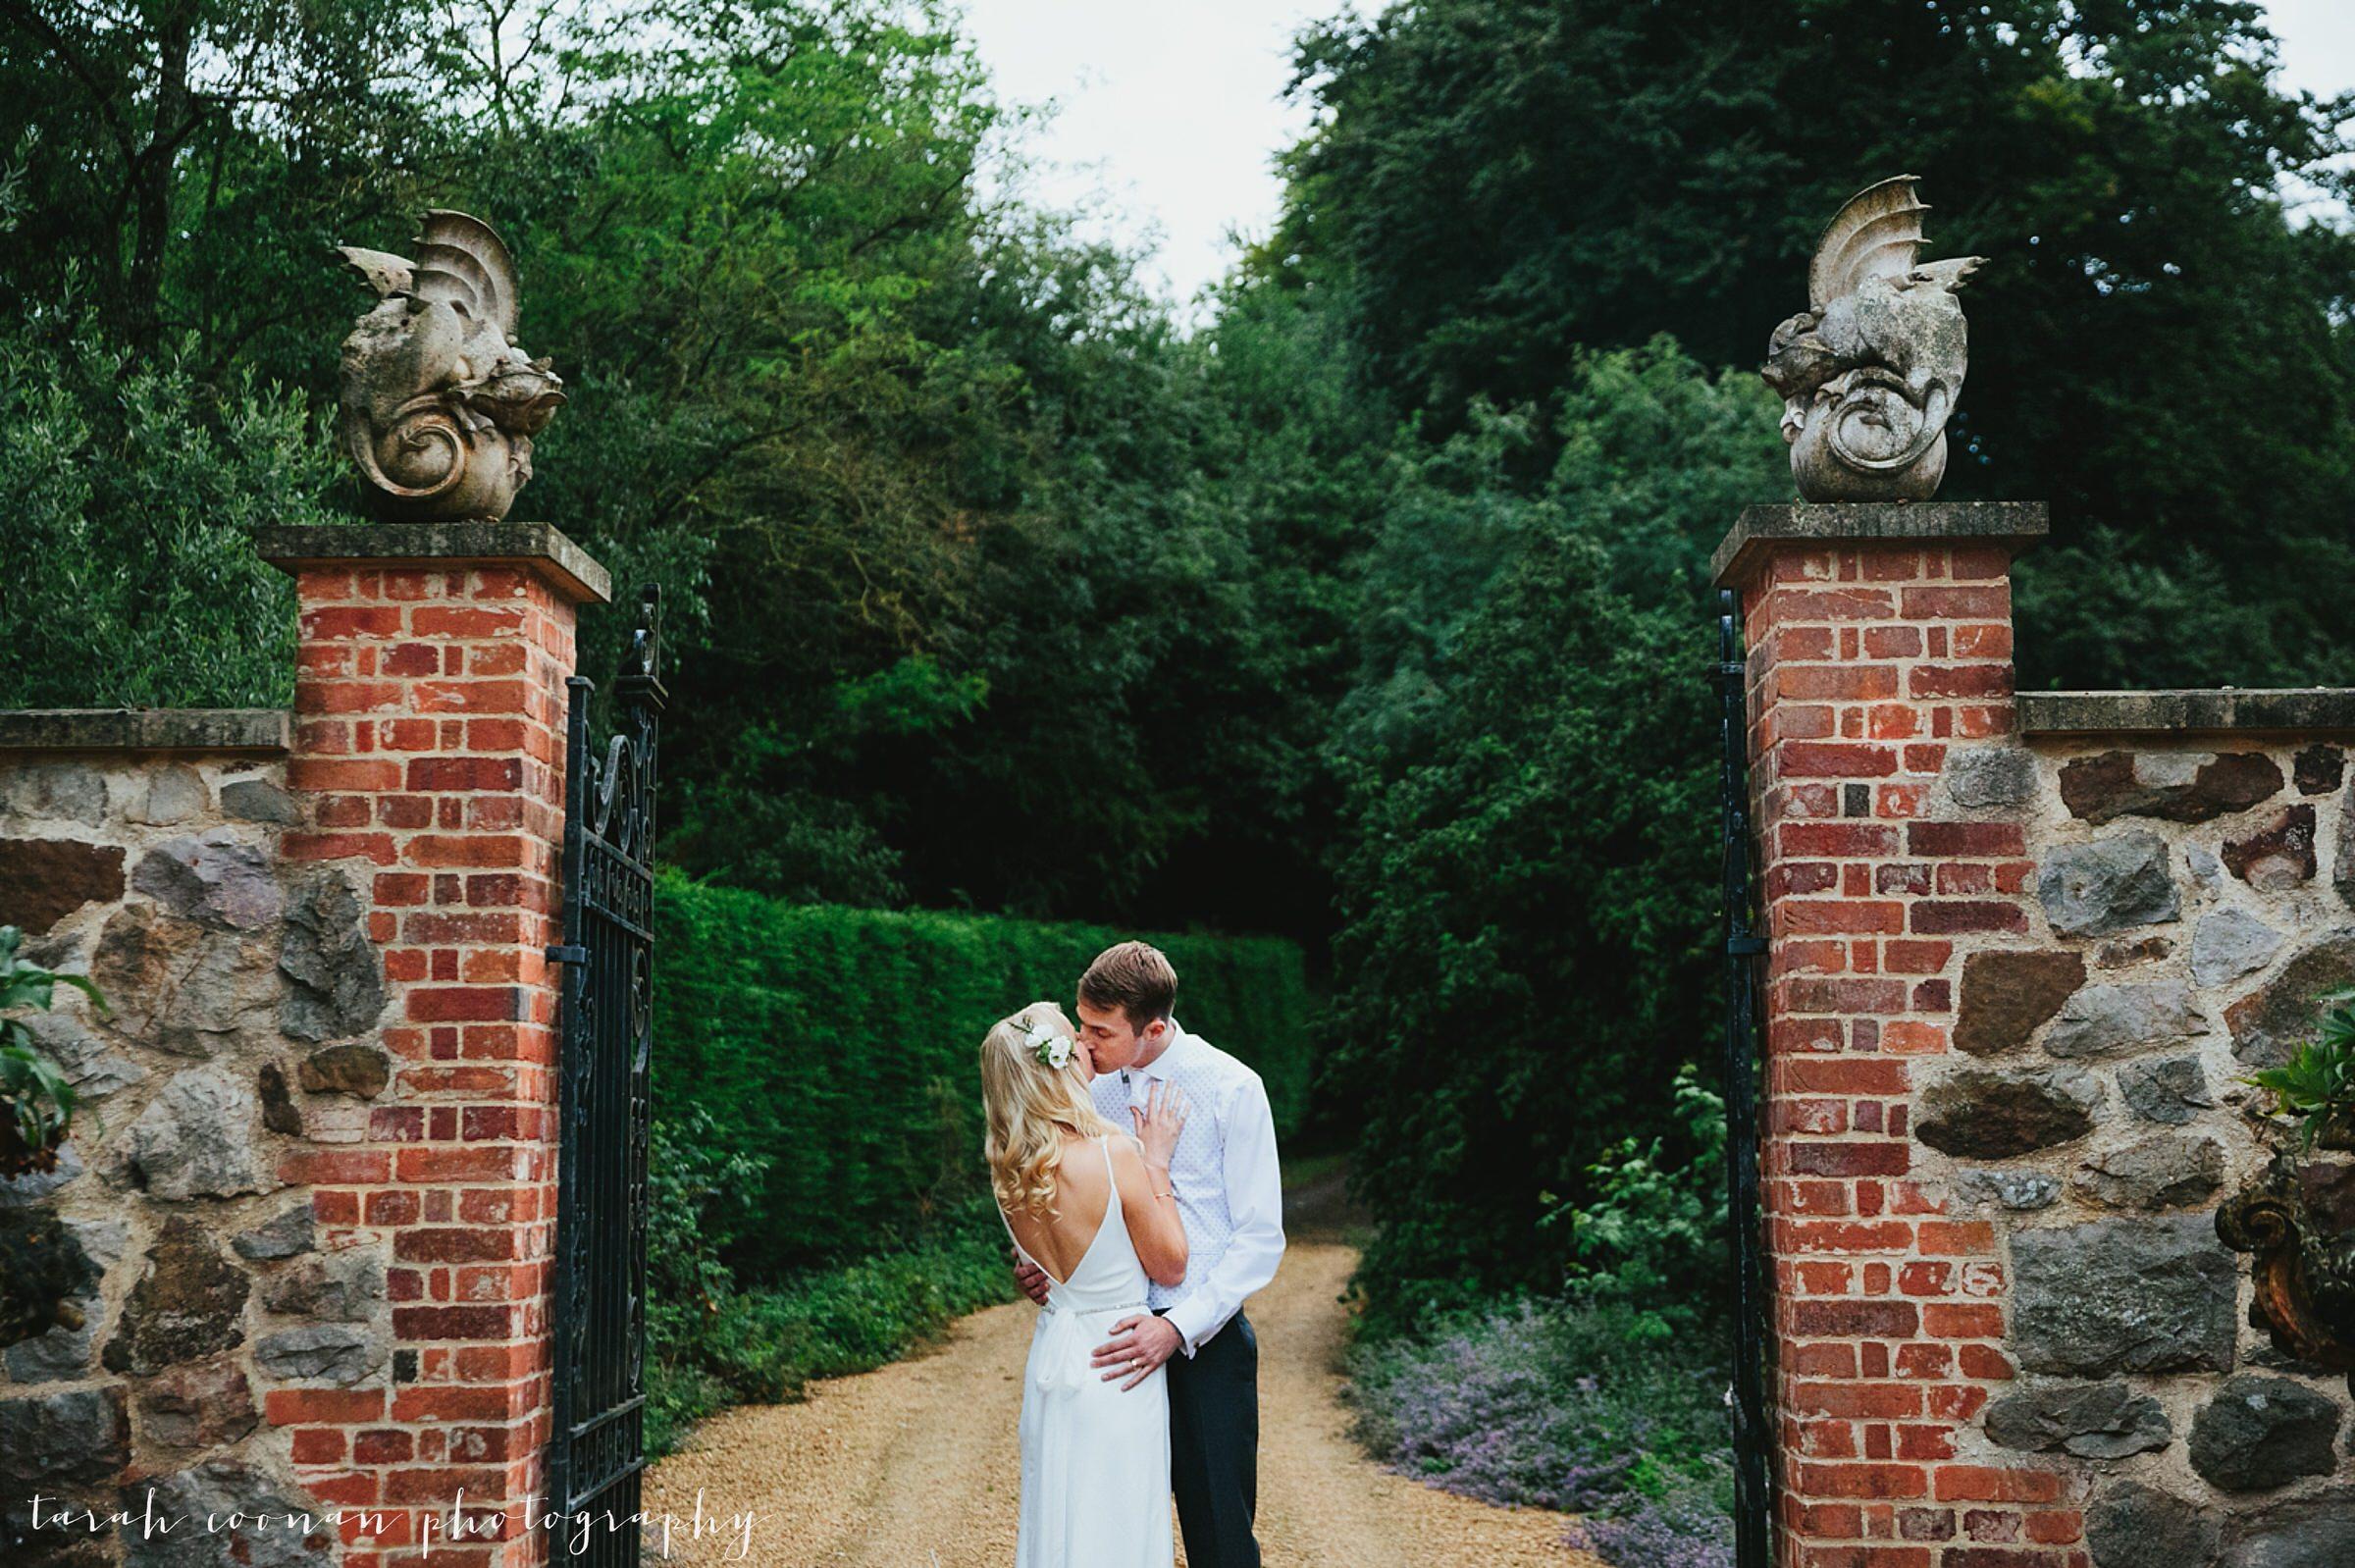 Rockley Manor Wedding - Sarah & Lawrence